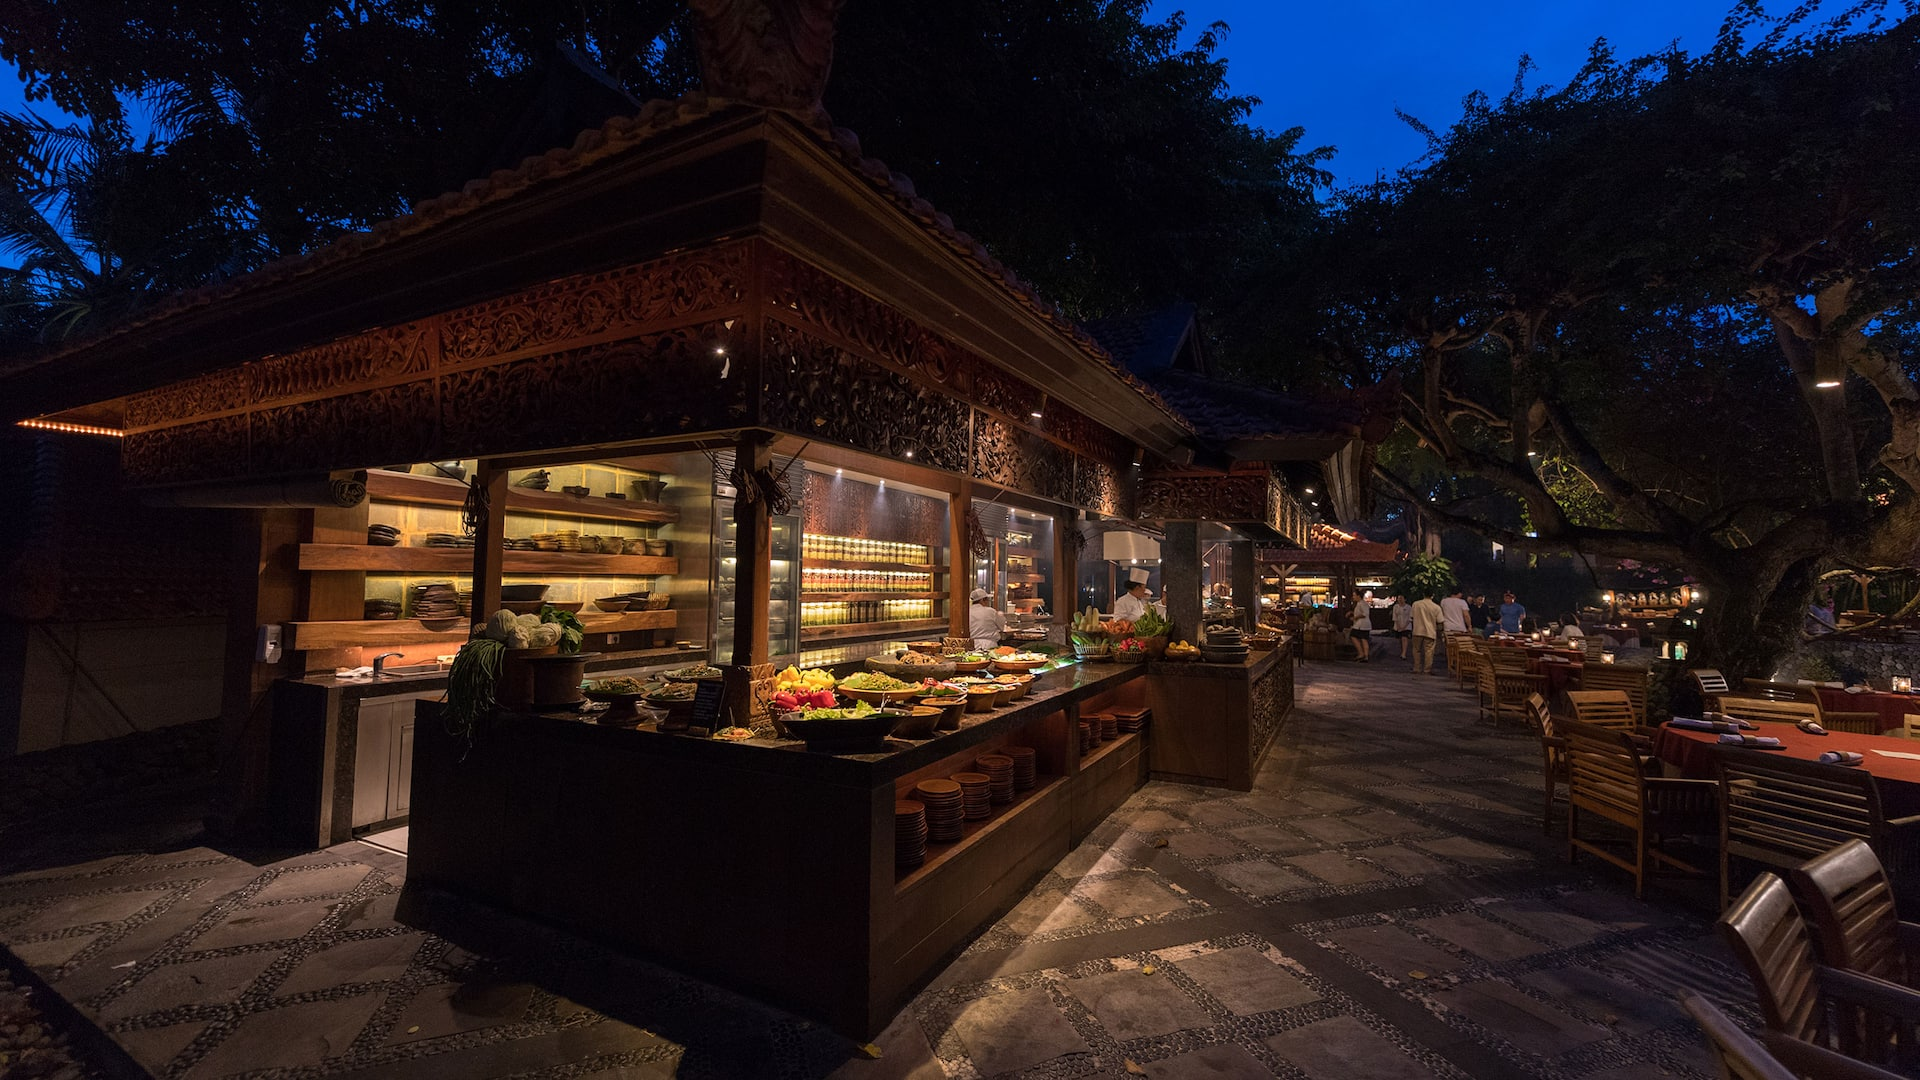 Pasar Senggol Buffet Restaurant Nusa Dua Bali - Grand Hyatt Bali